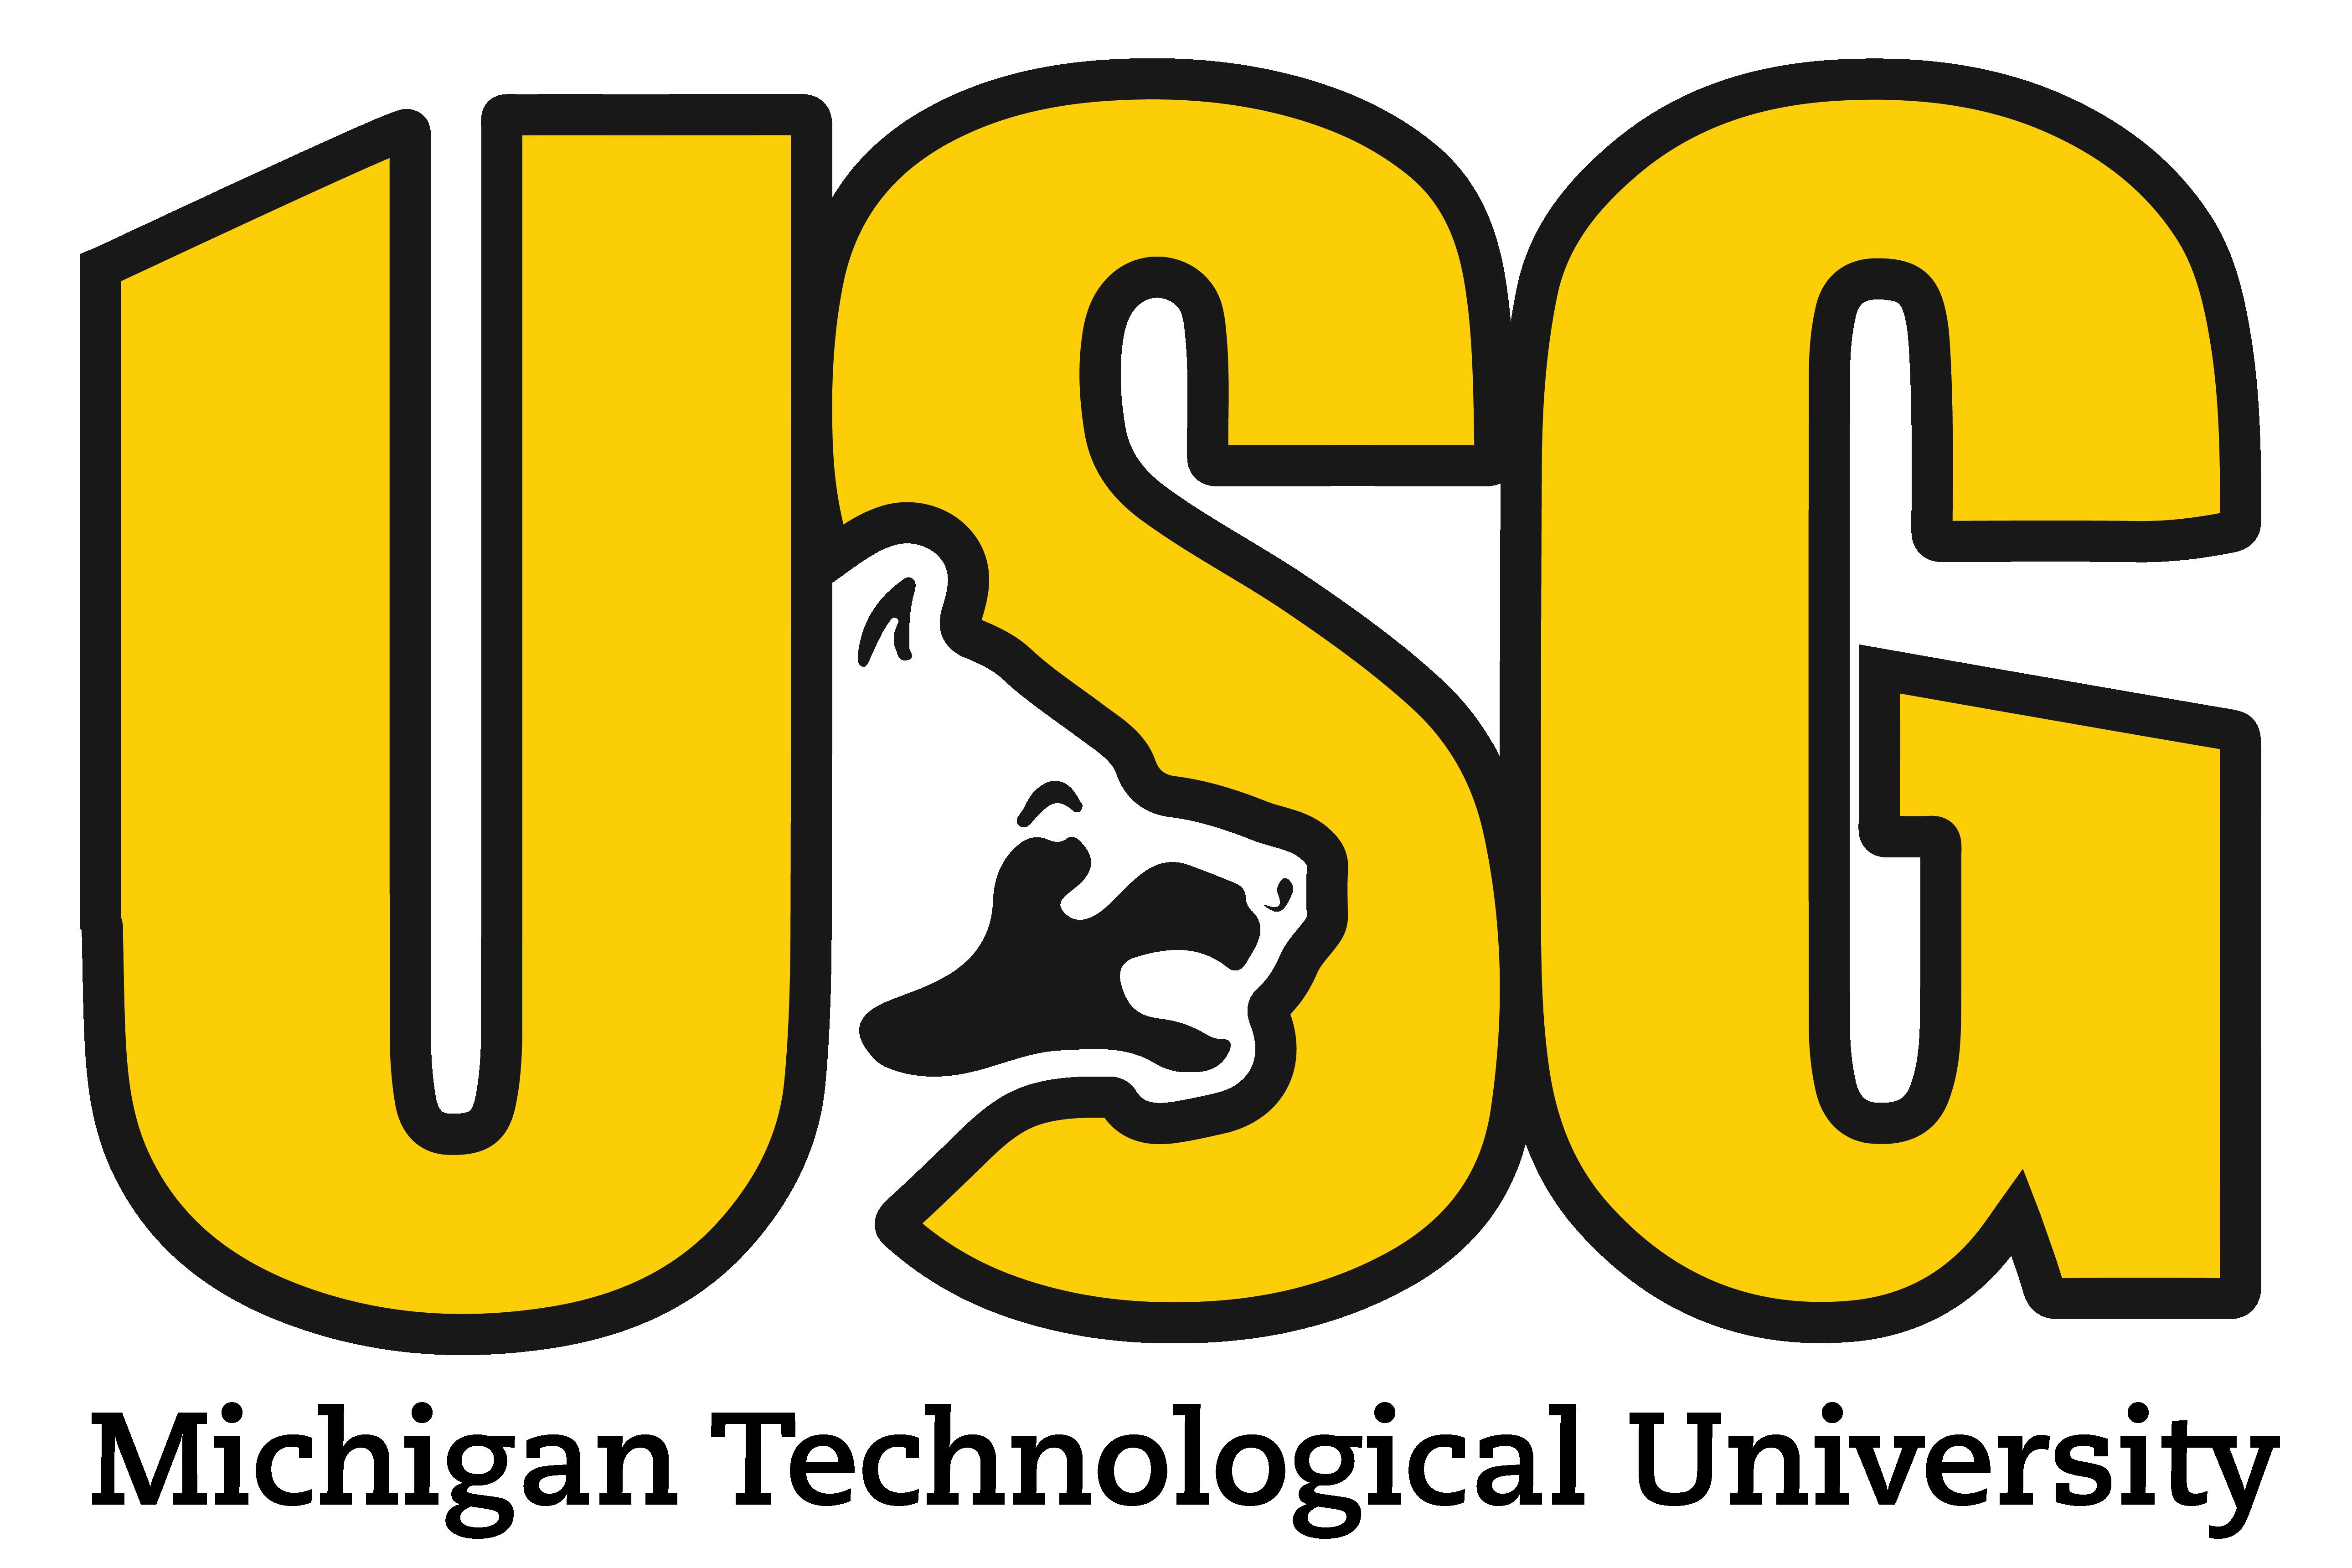 USG @ Michigan Tech